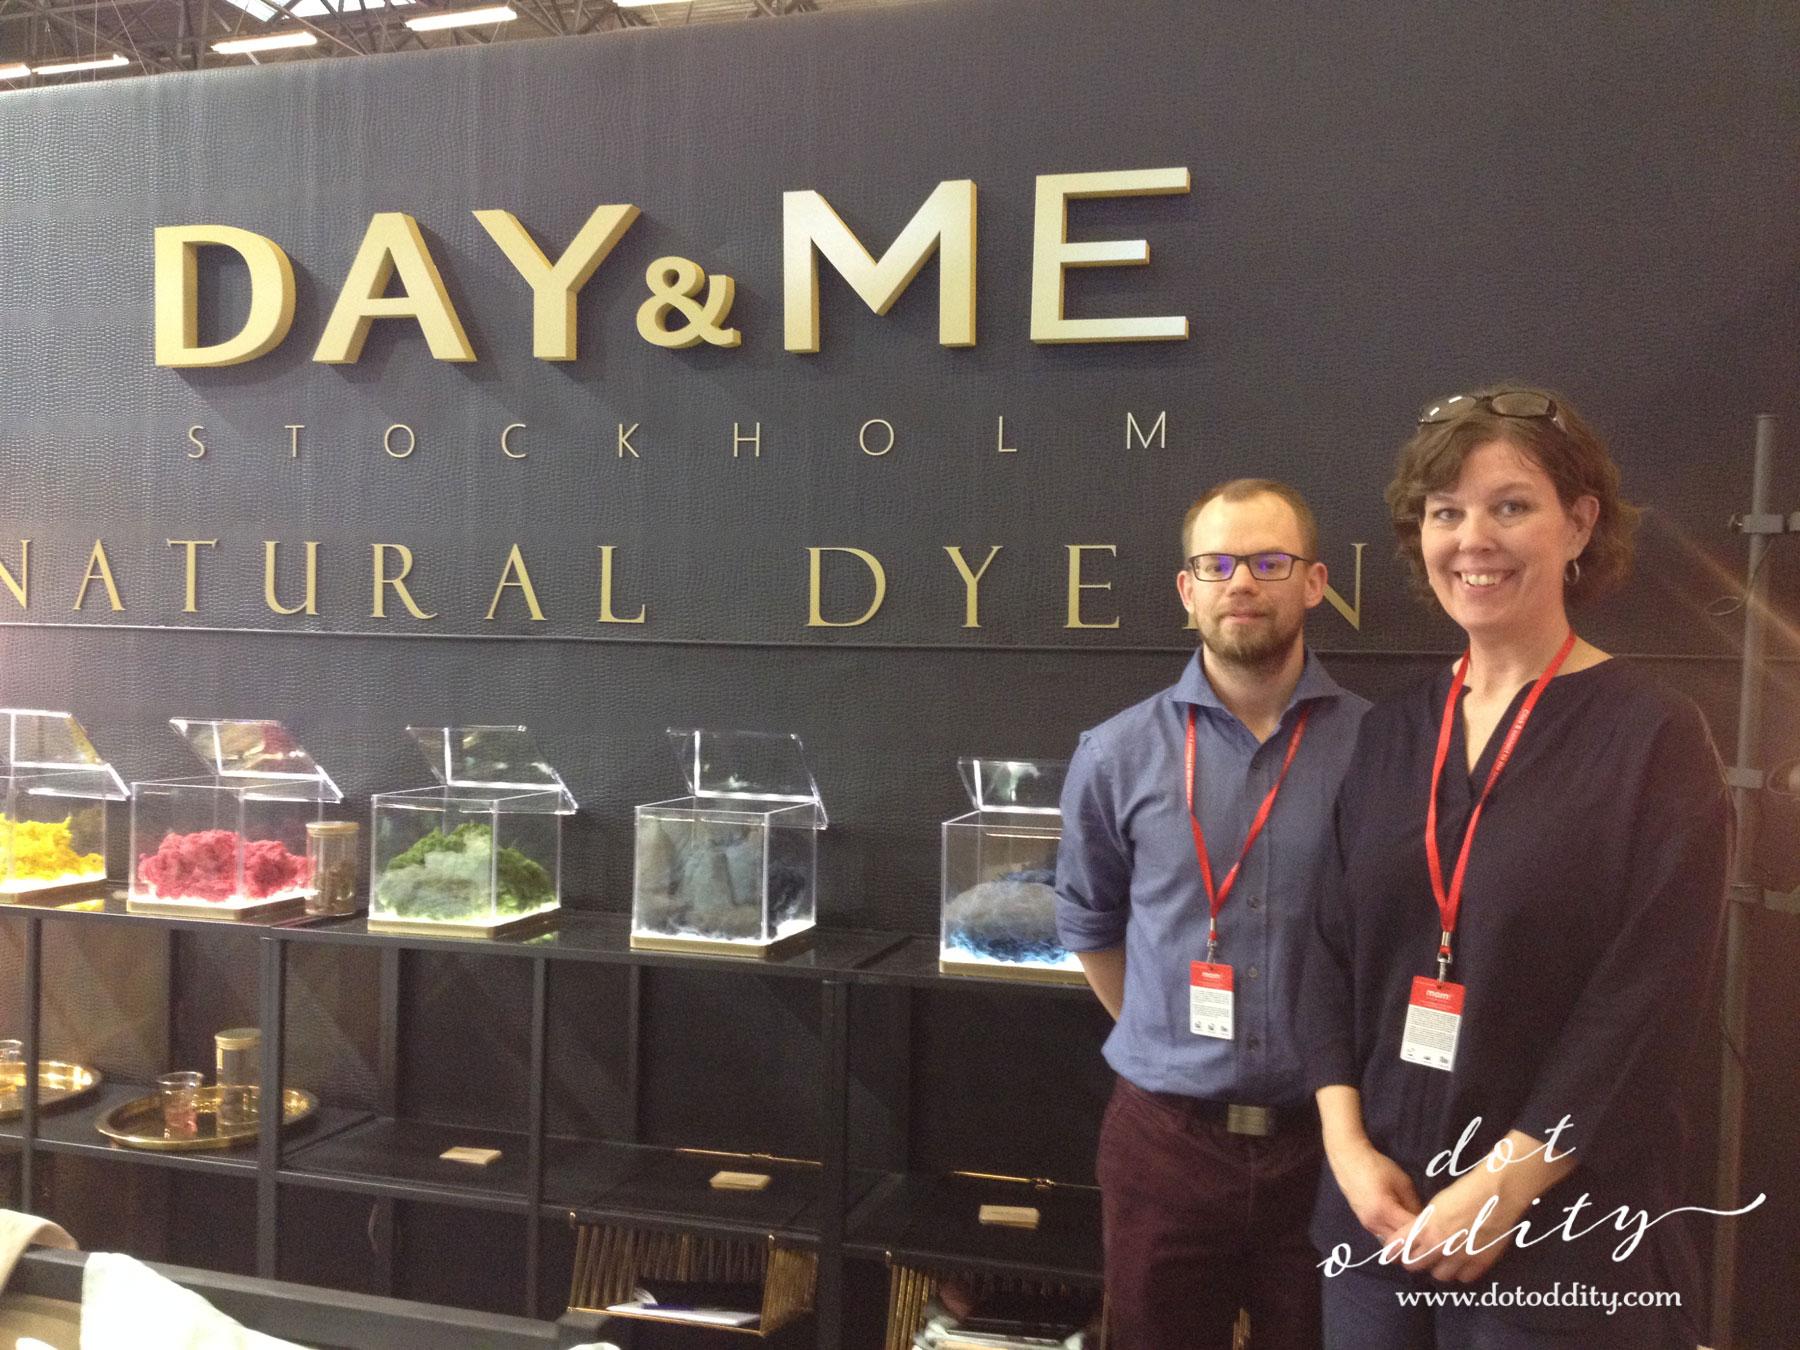 Day&Me Stockholm